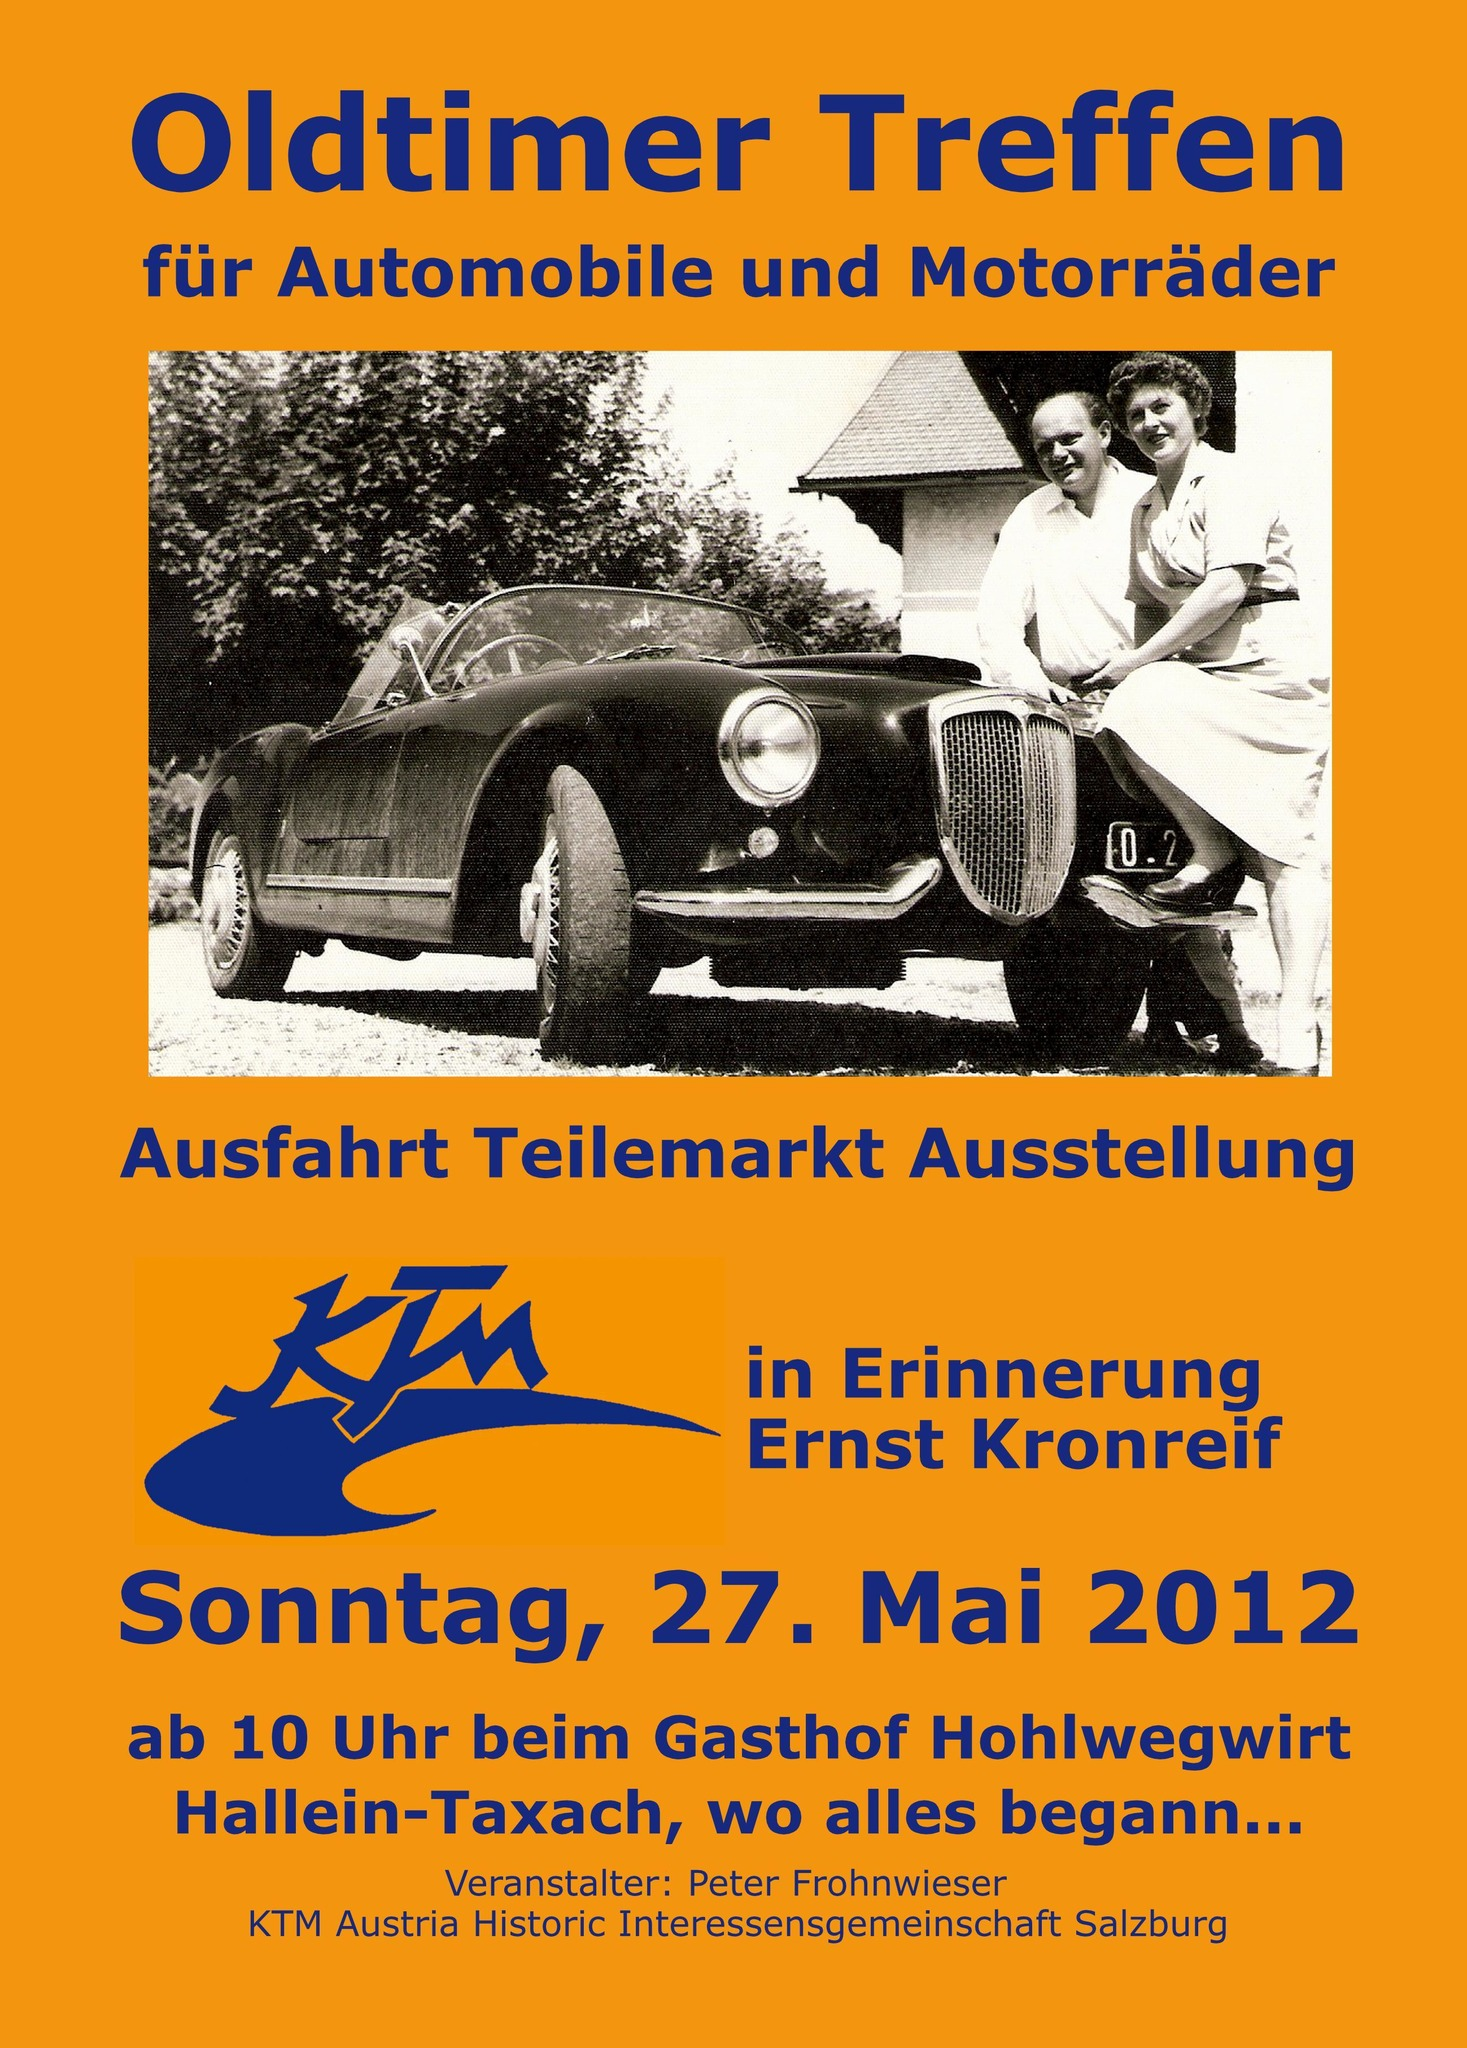 KTM Historic Sternfahrt beim Gasthof Hotel Hohlwegwirt